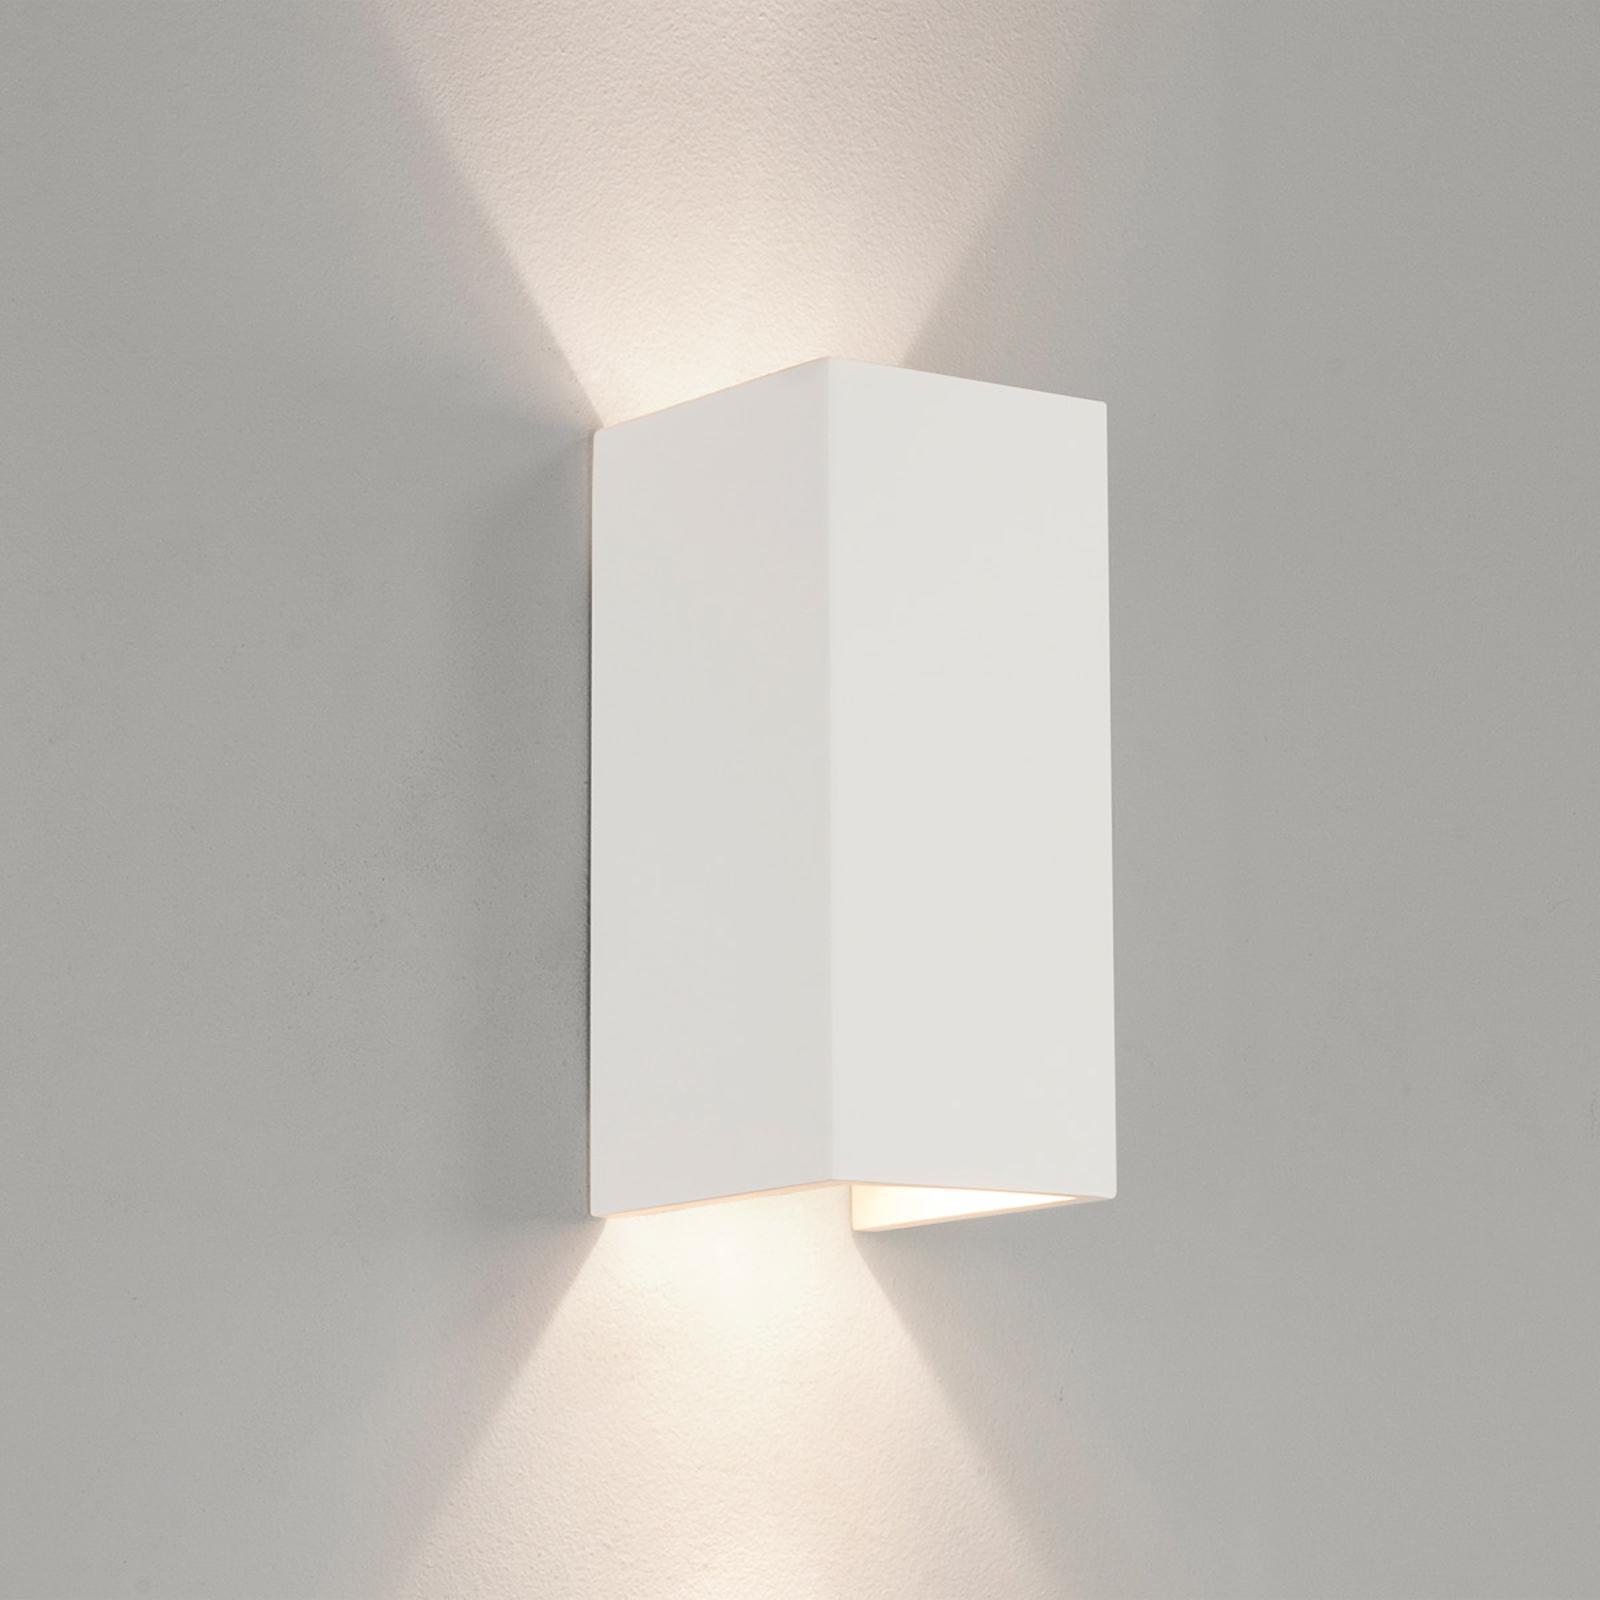 Astro Parma 210 wall light in white_1020346_1